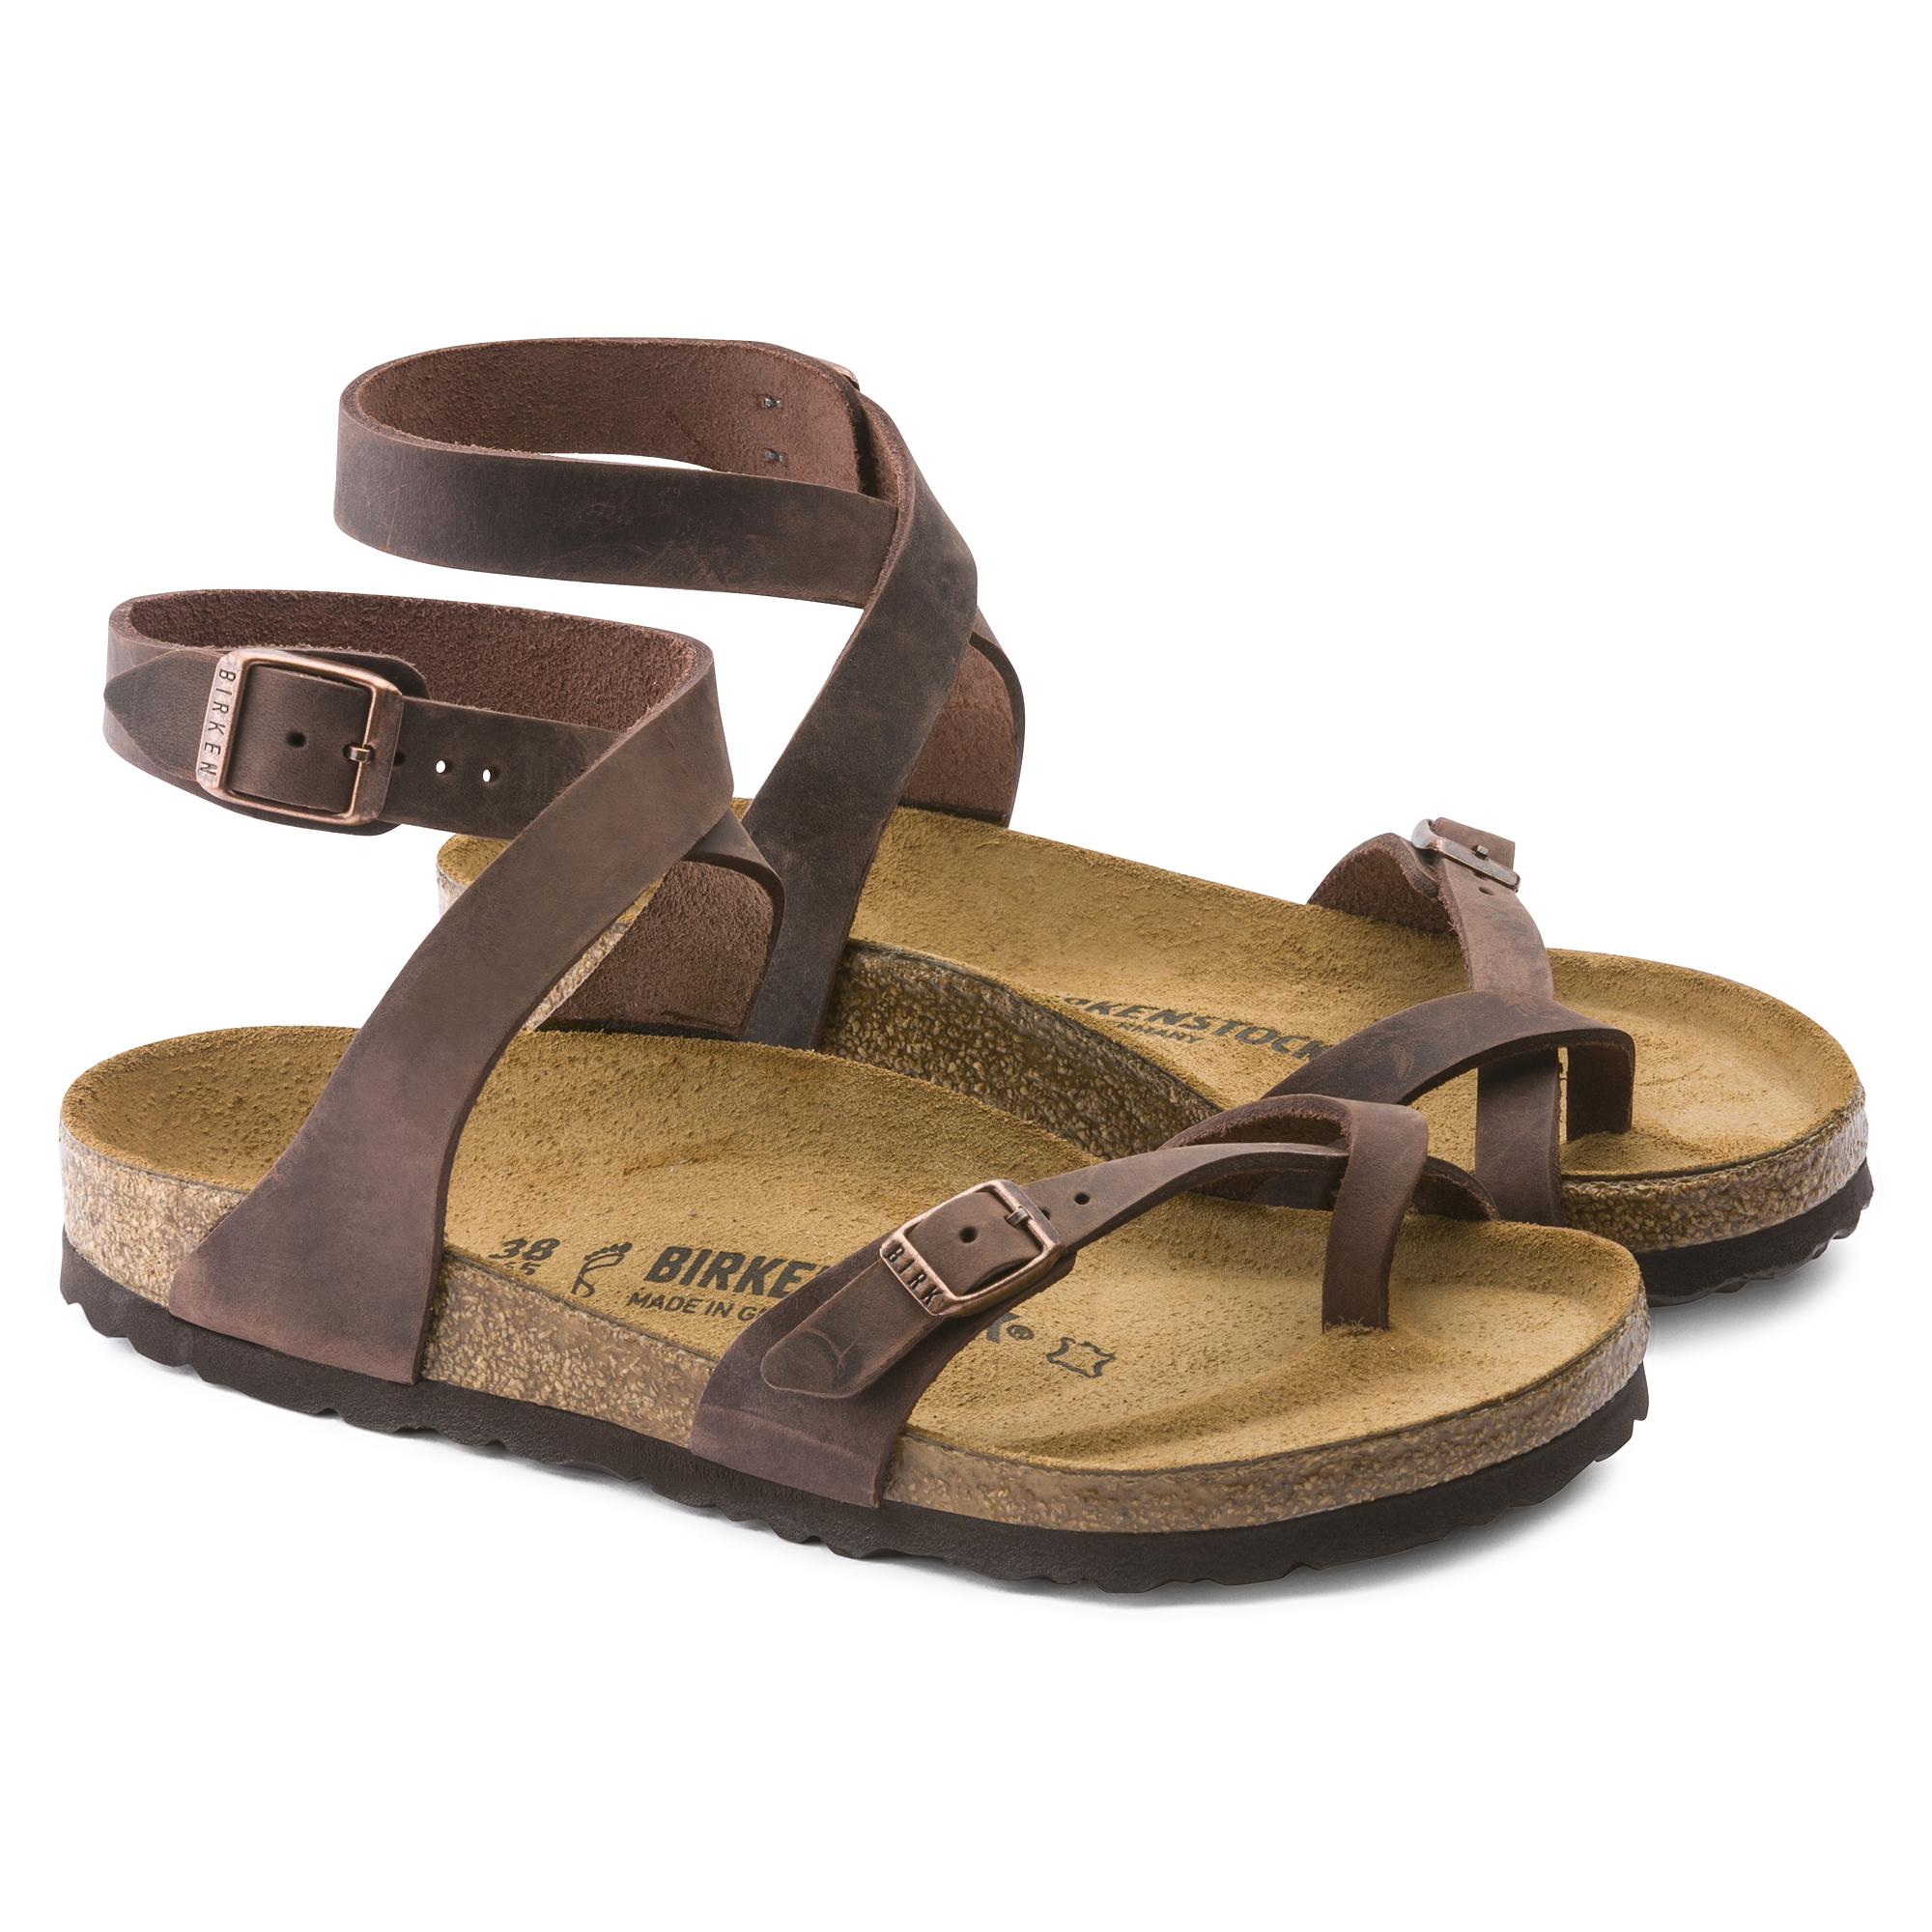 c0fd55719fc3d Yara Oiled Leather